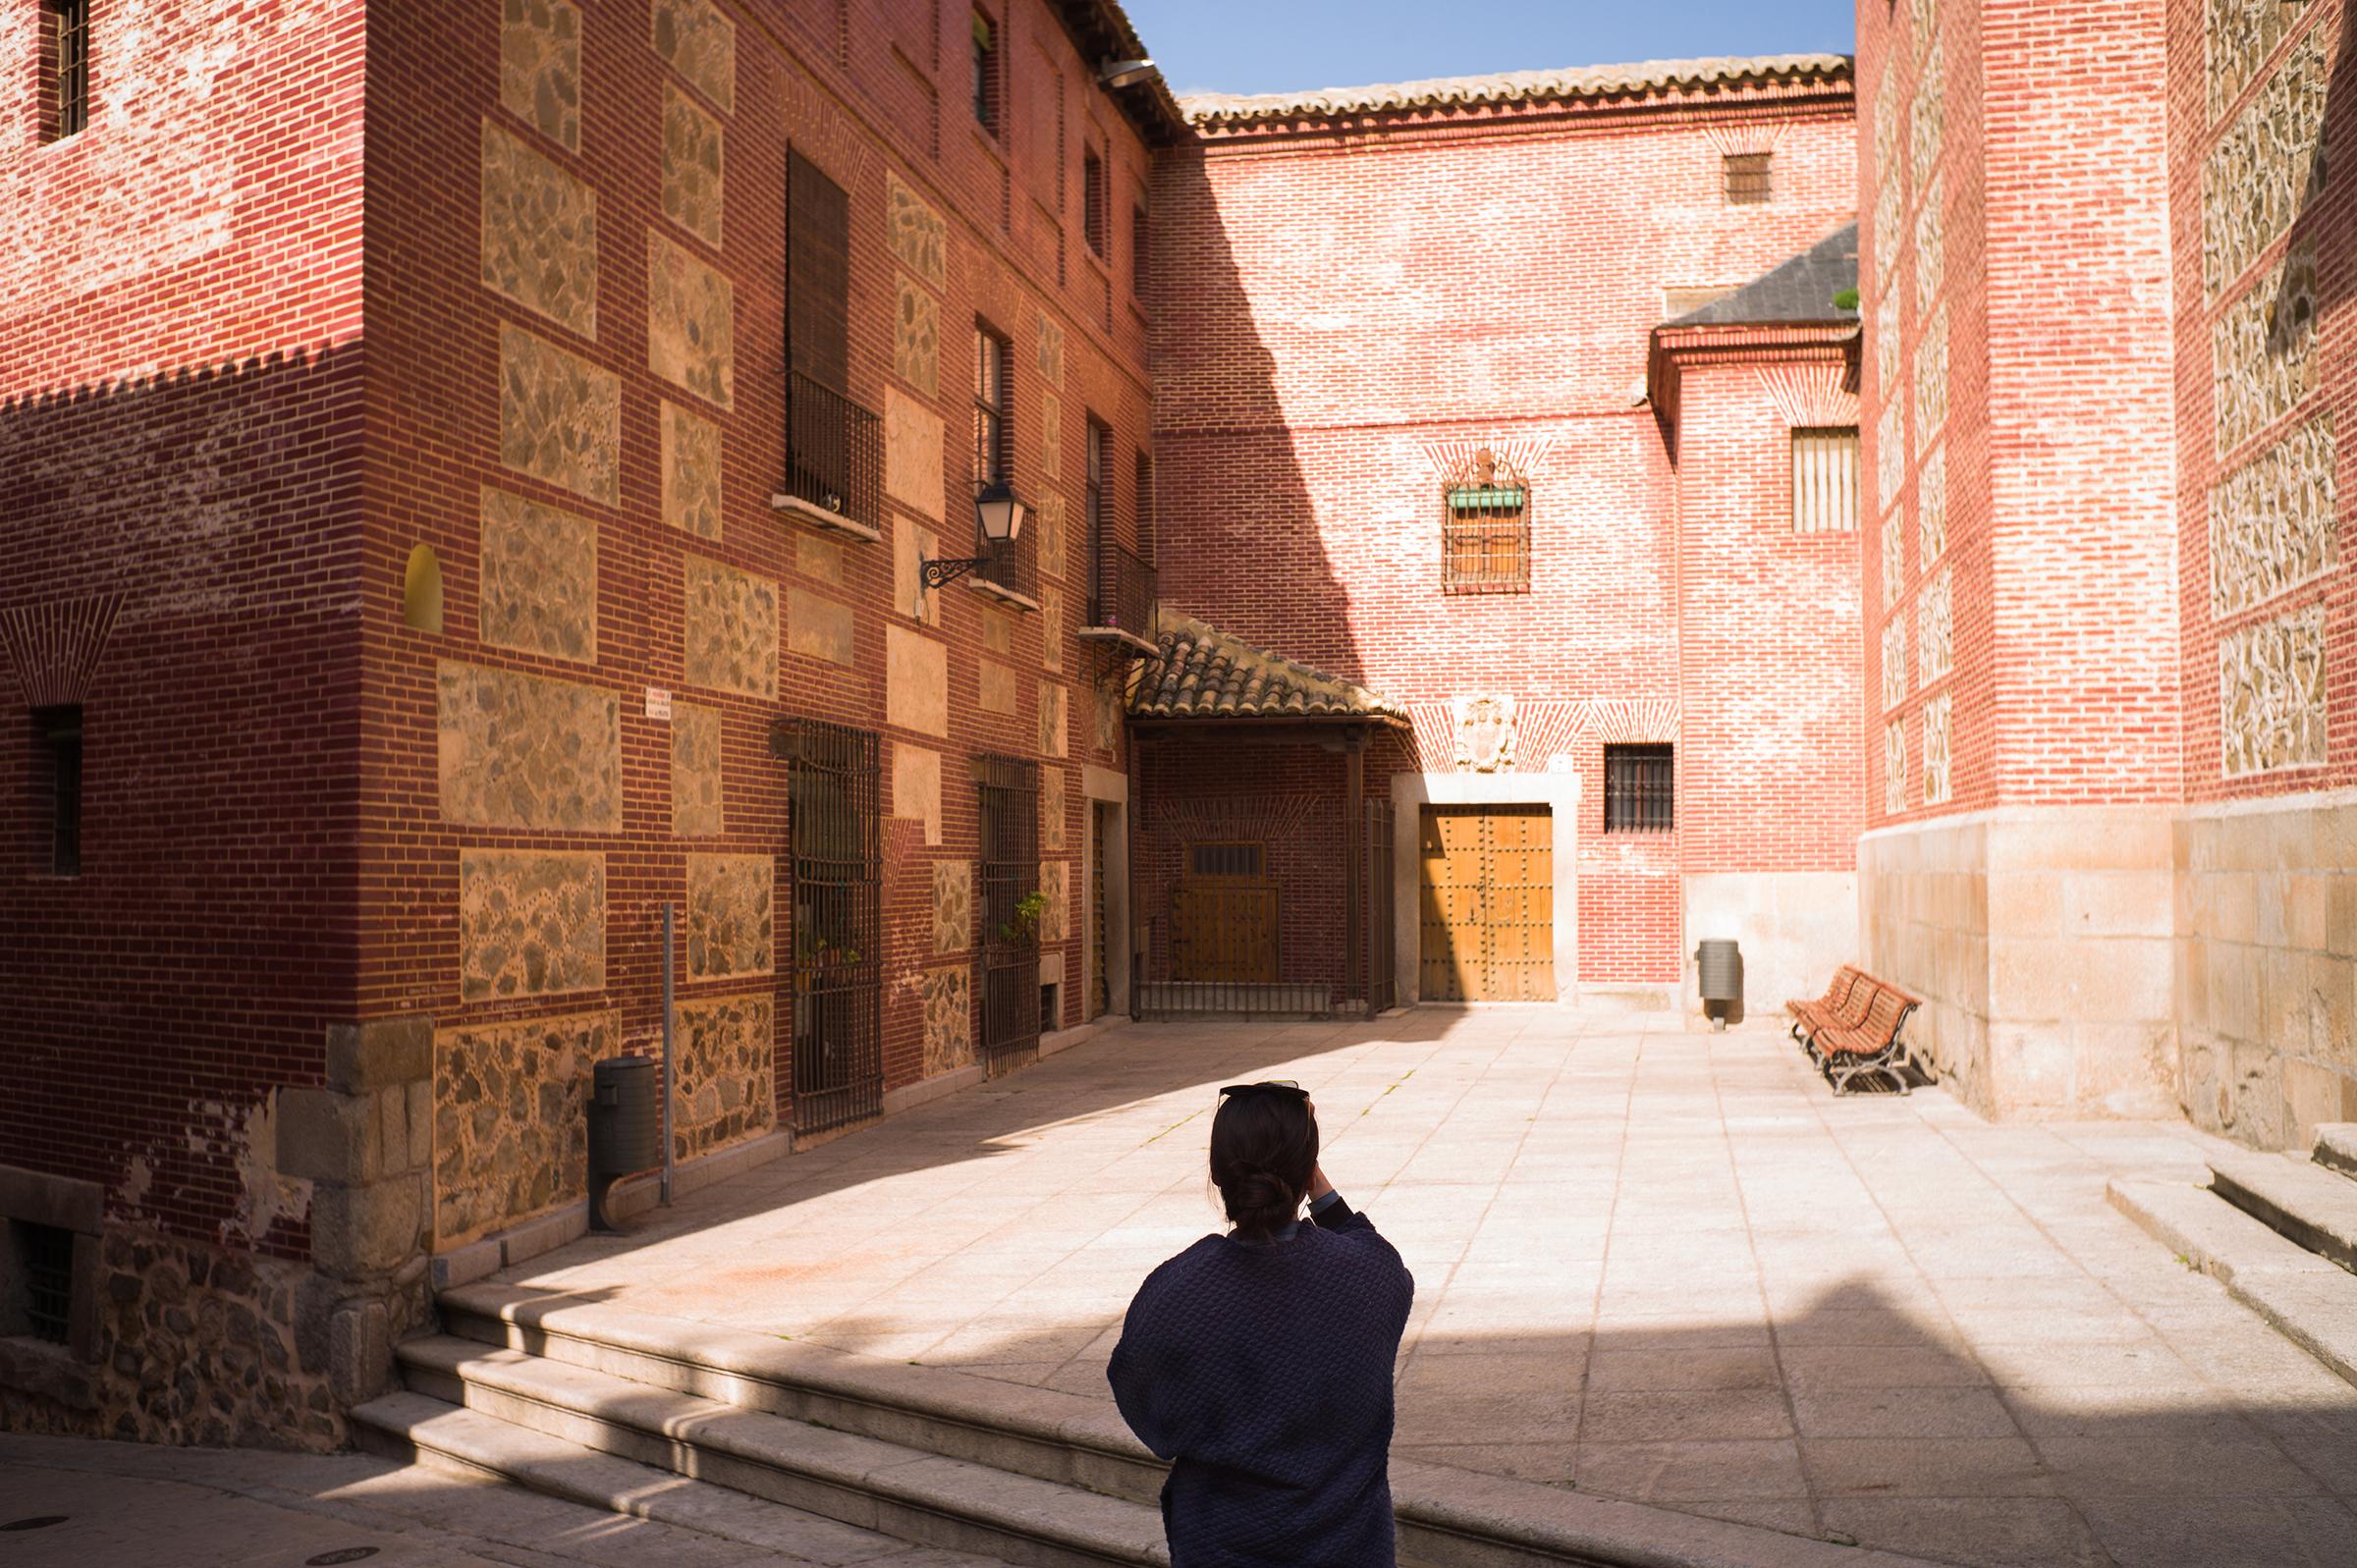 Exploring Toledo Spain